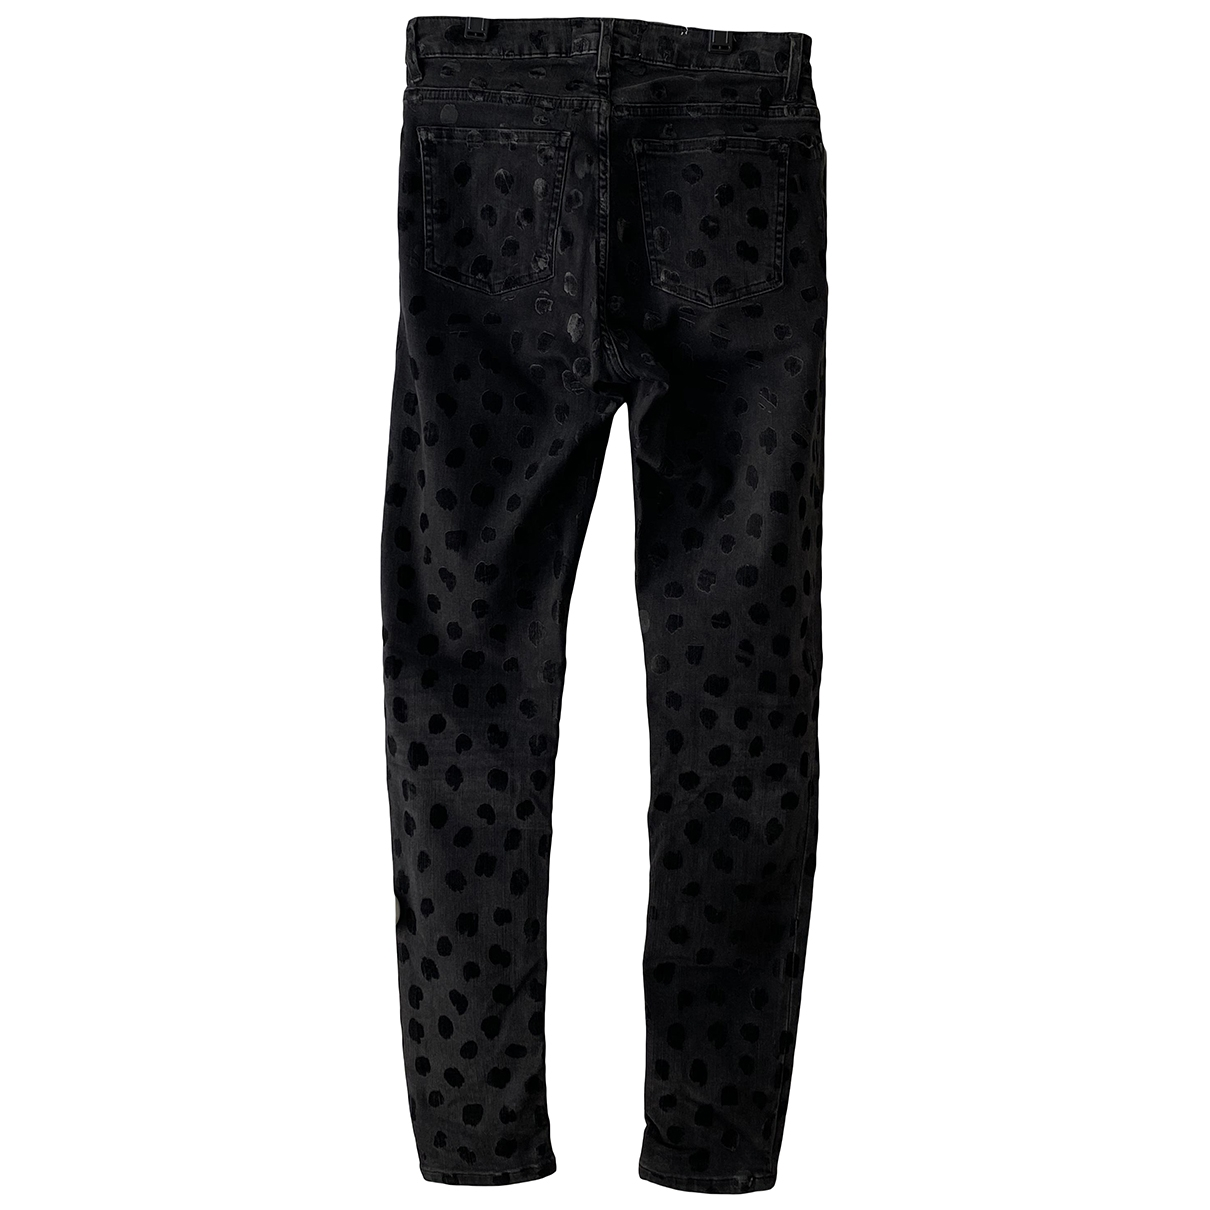 Acne Studios \N Denim - Jeans Jeans for Women 27 US